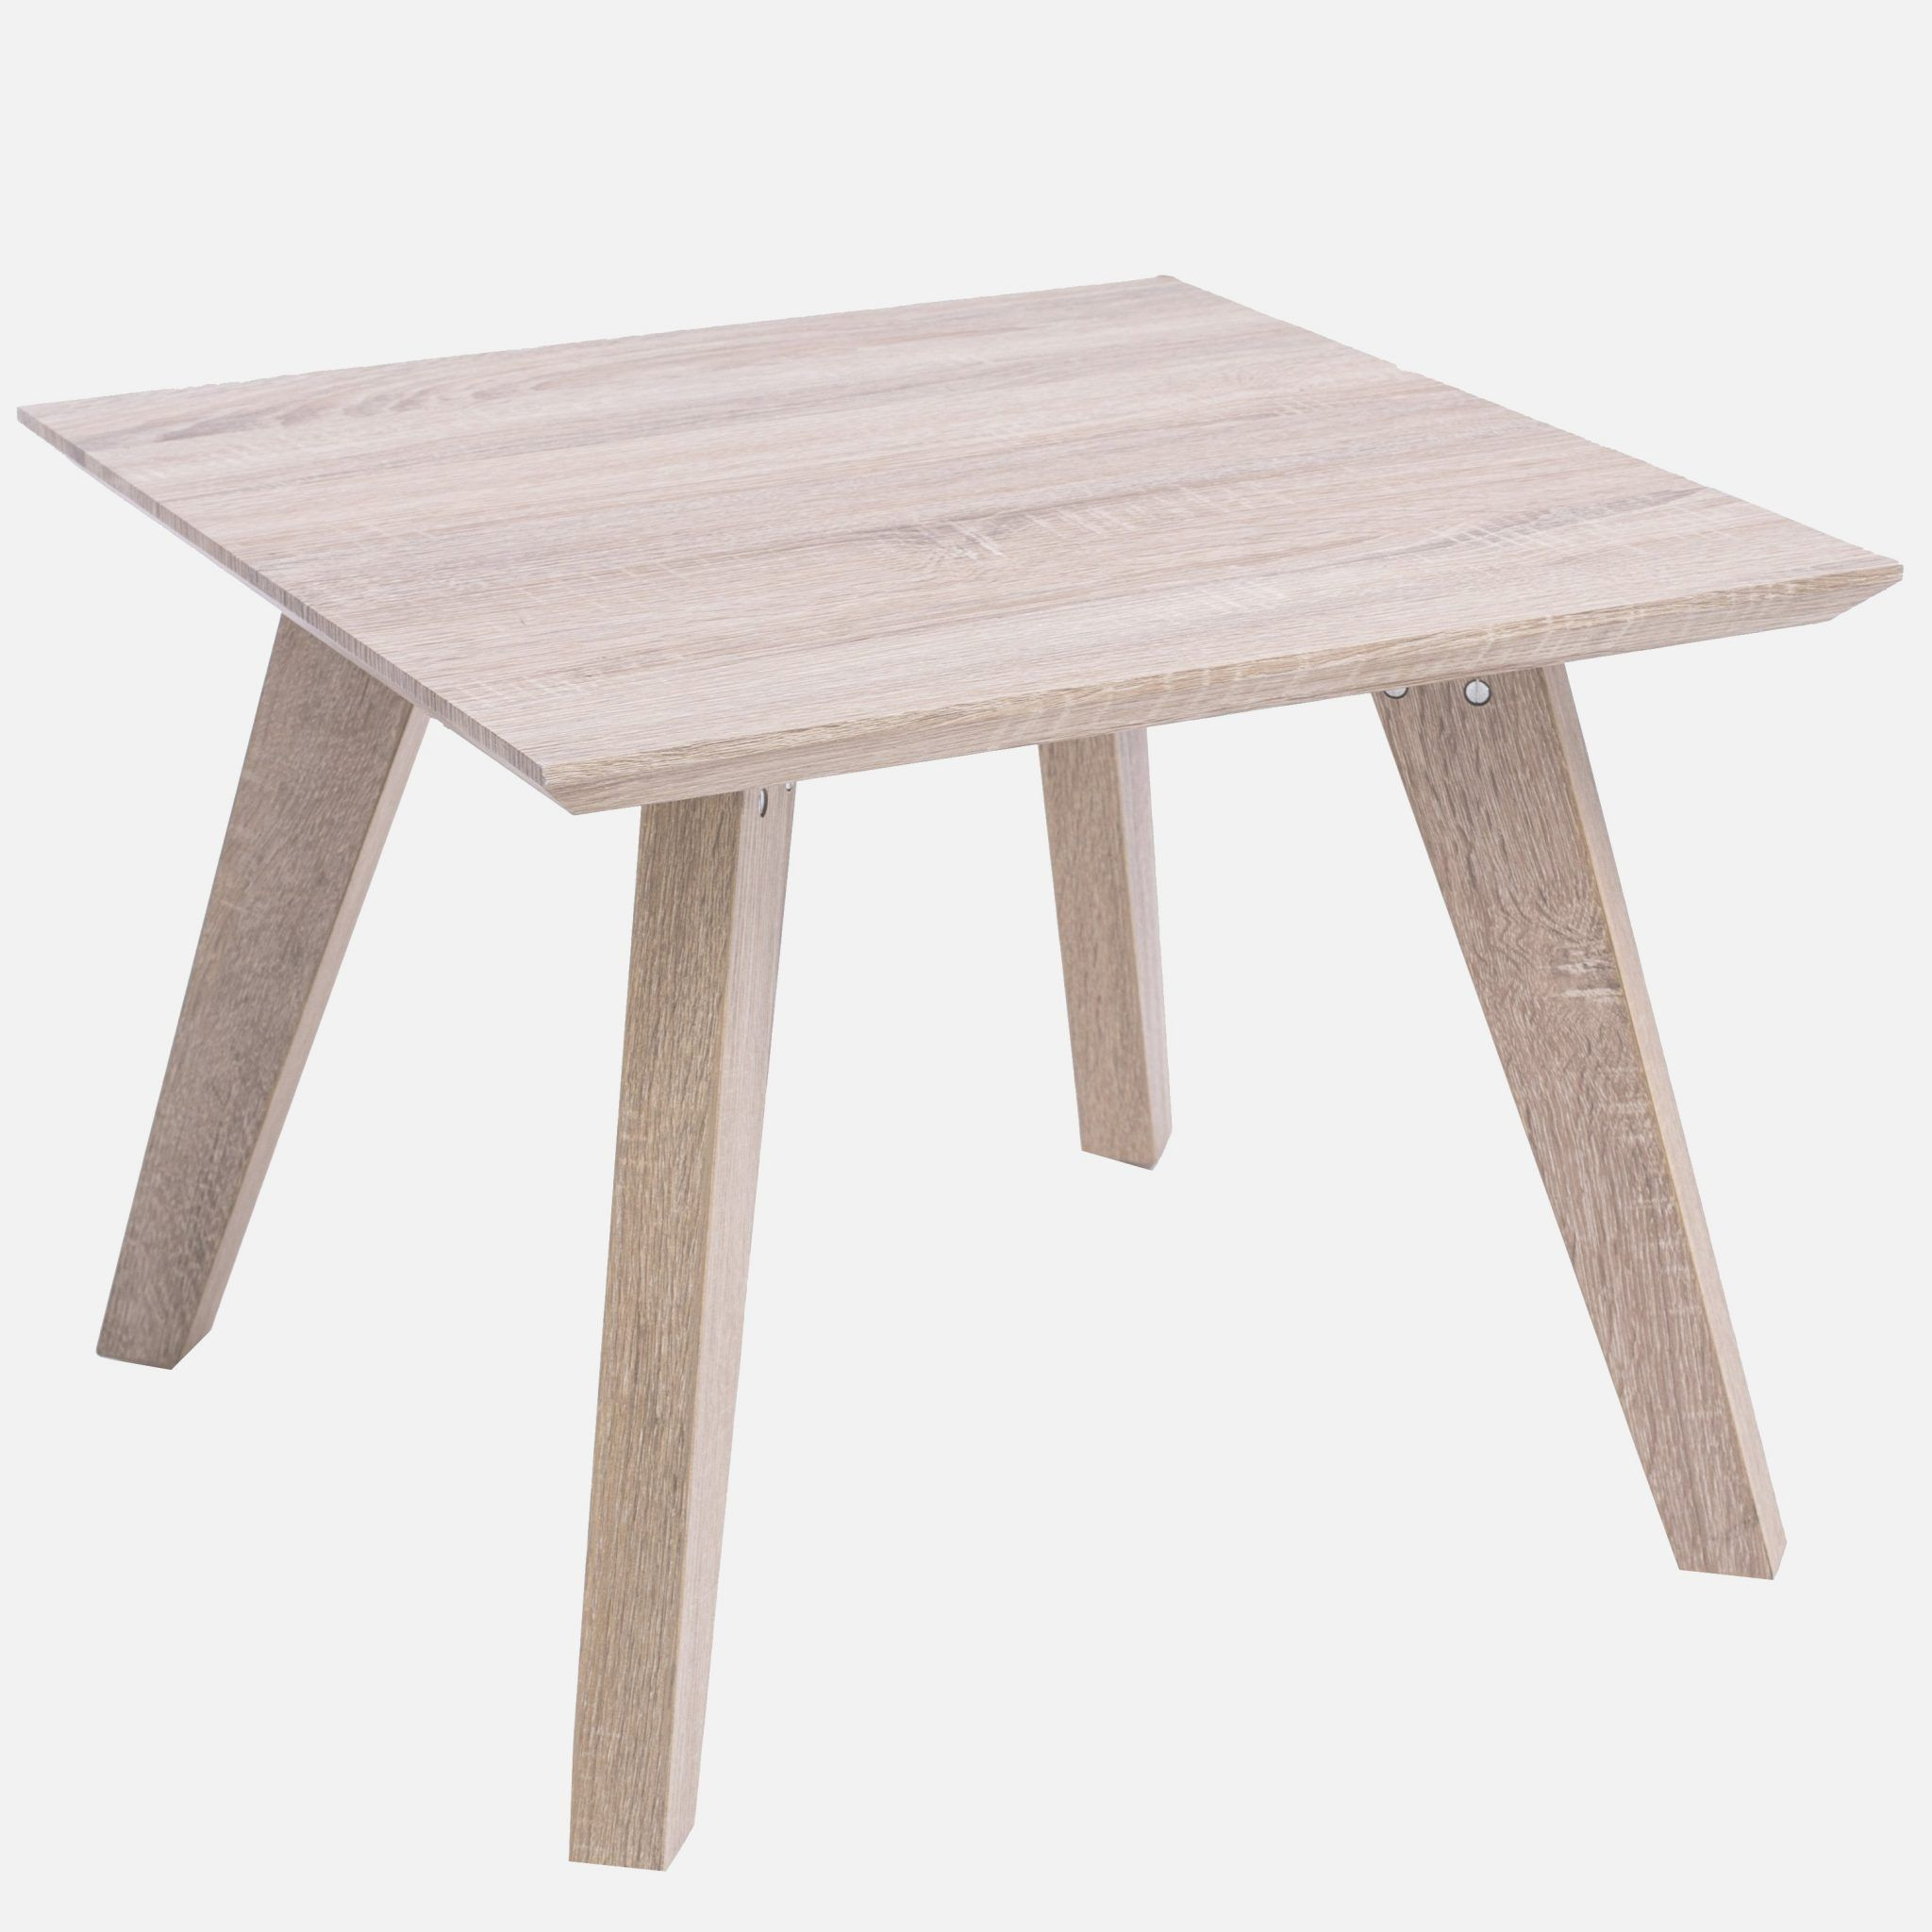 rattan side tables living room coastal design argos table ikea